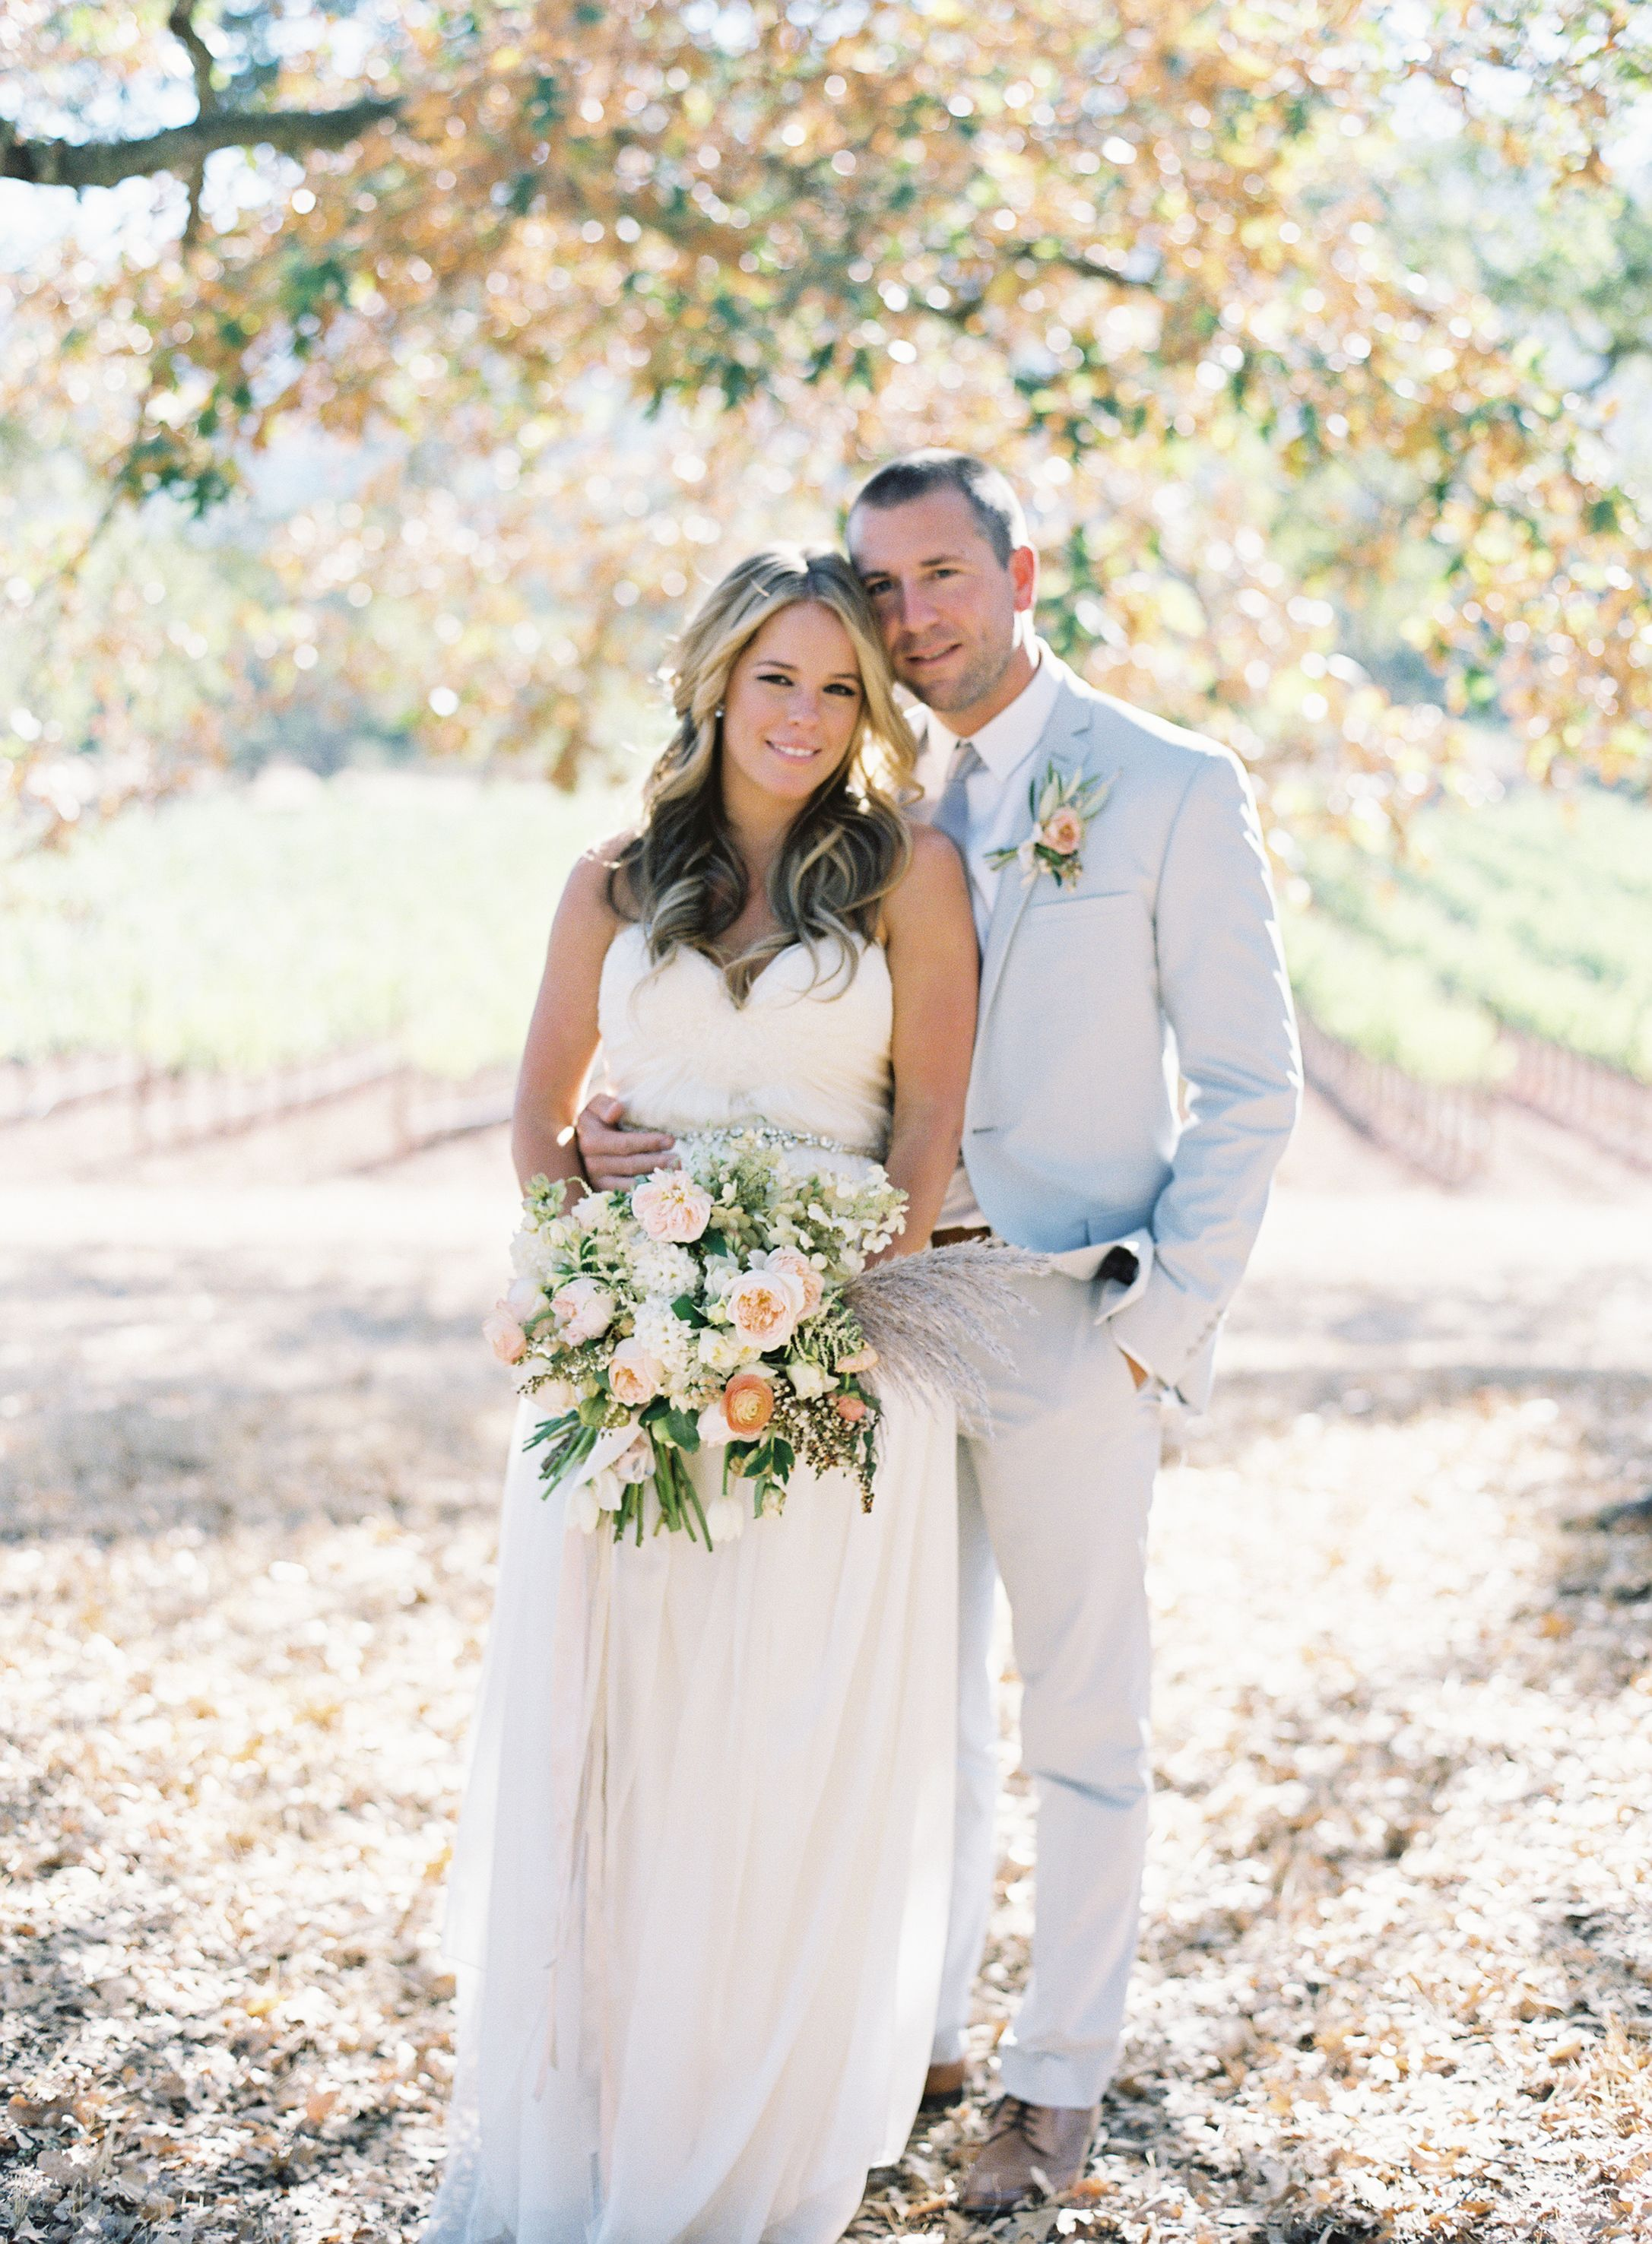 Cheap rustic wedding dresses  Vineyard Wedding  HairMakeup by Mimi  Taylor  Wedding dress by